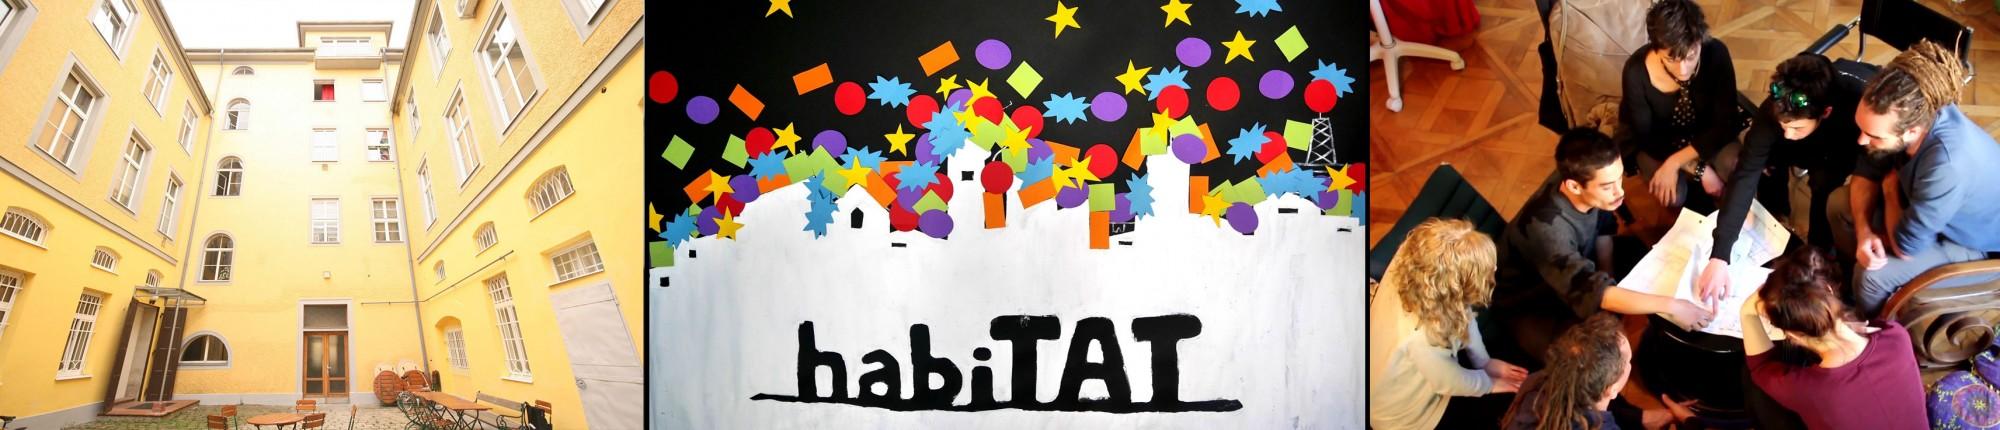 banner-habitat